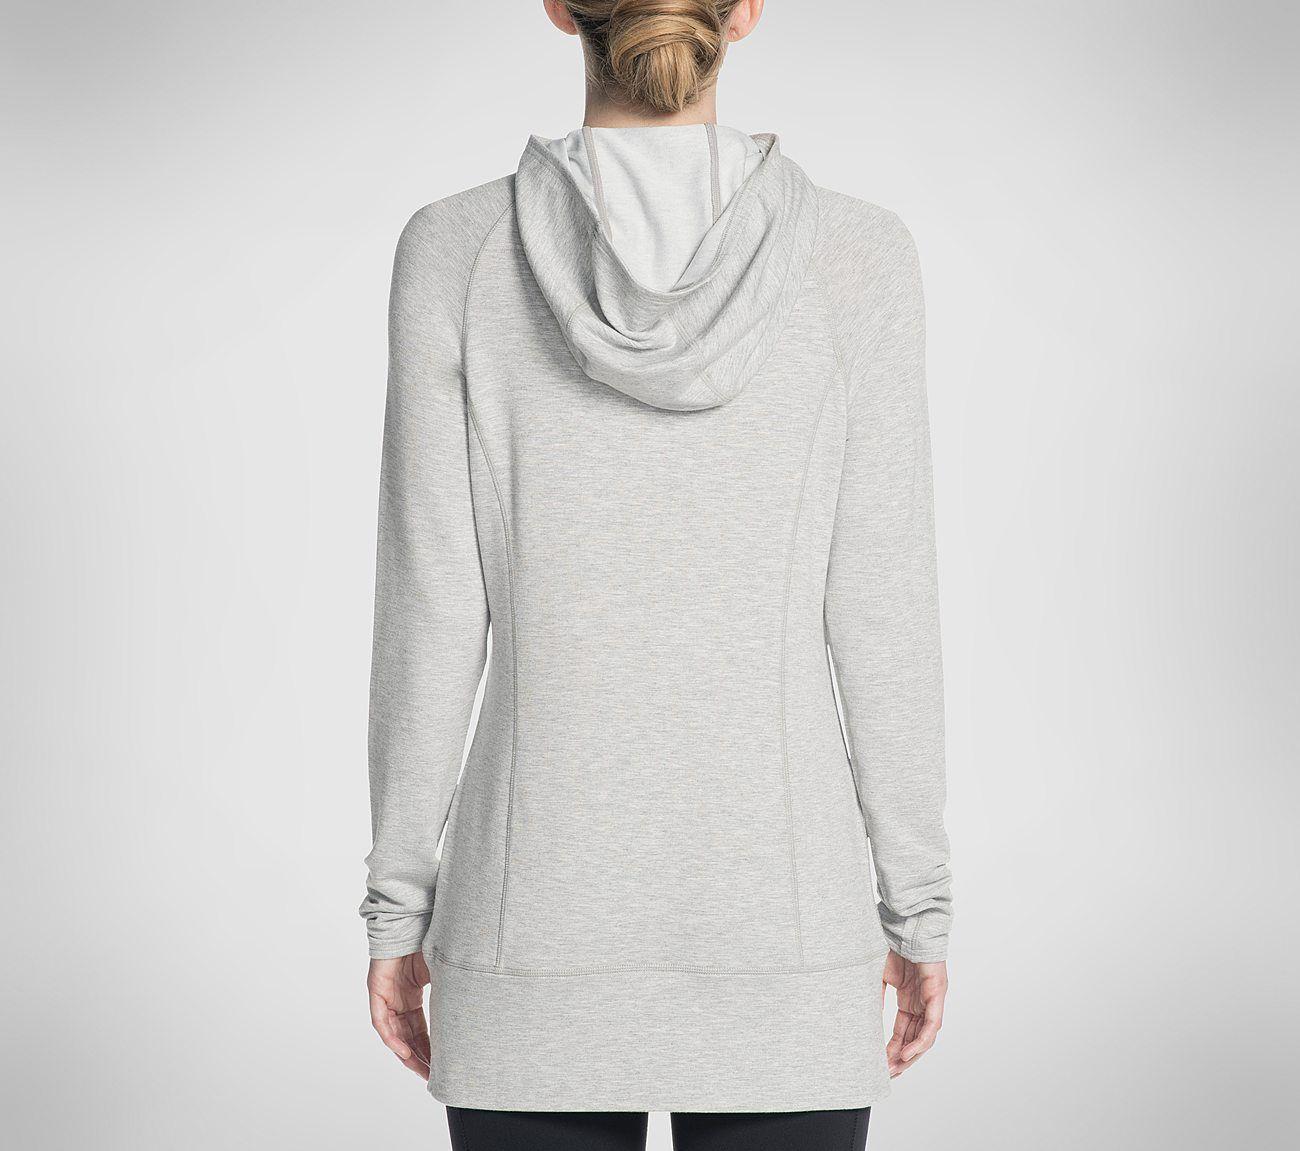 Пуловер женские Skechers модель KY77 , 2017